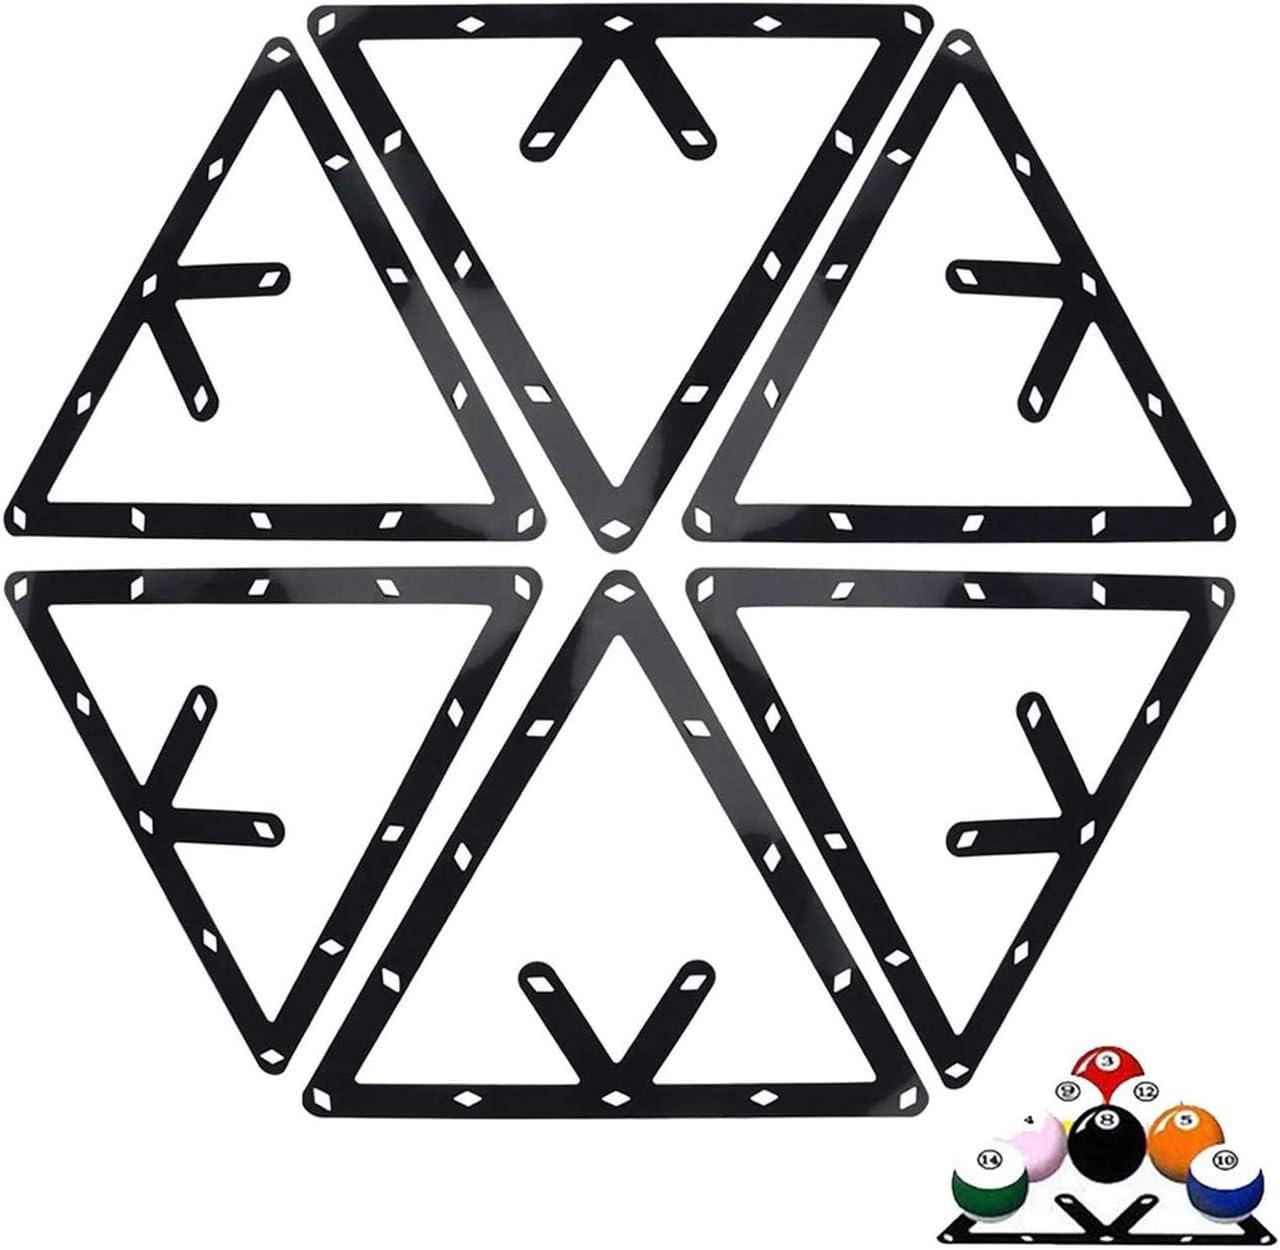 Ajcoflt 6 PCS Ball Rack Billar Rack Sheet Cue Ball Rack Cue Ball Accesorio